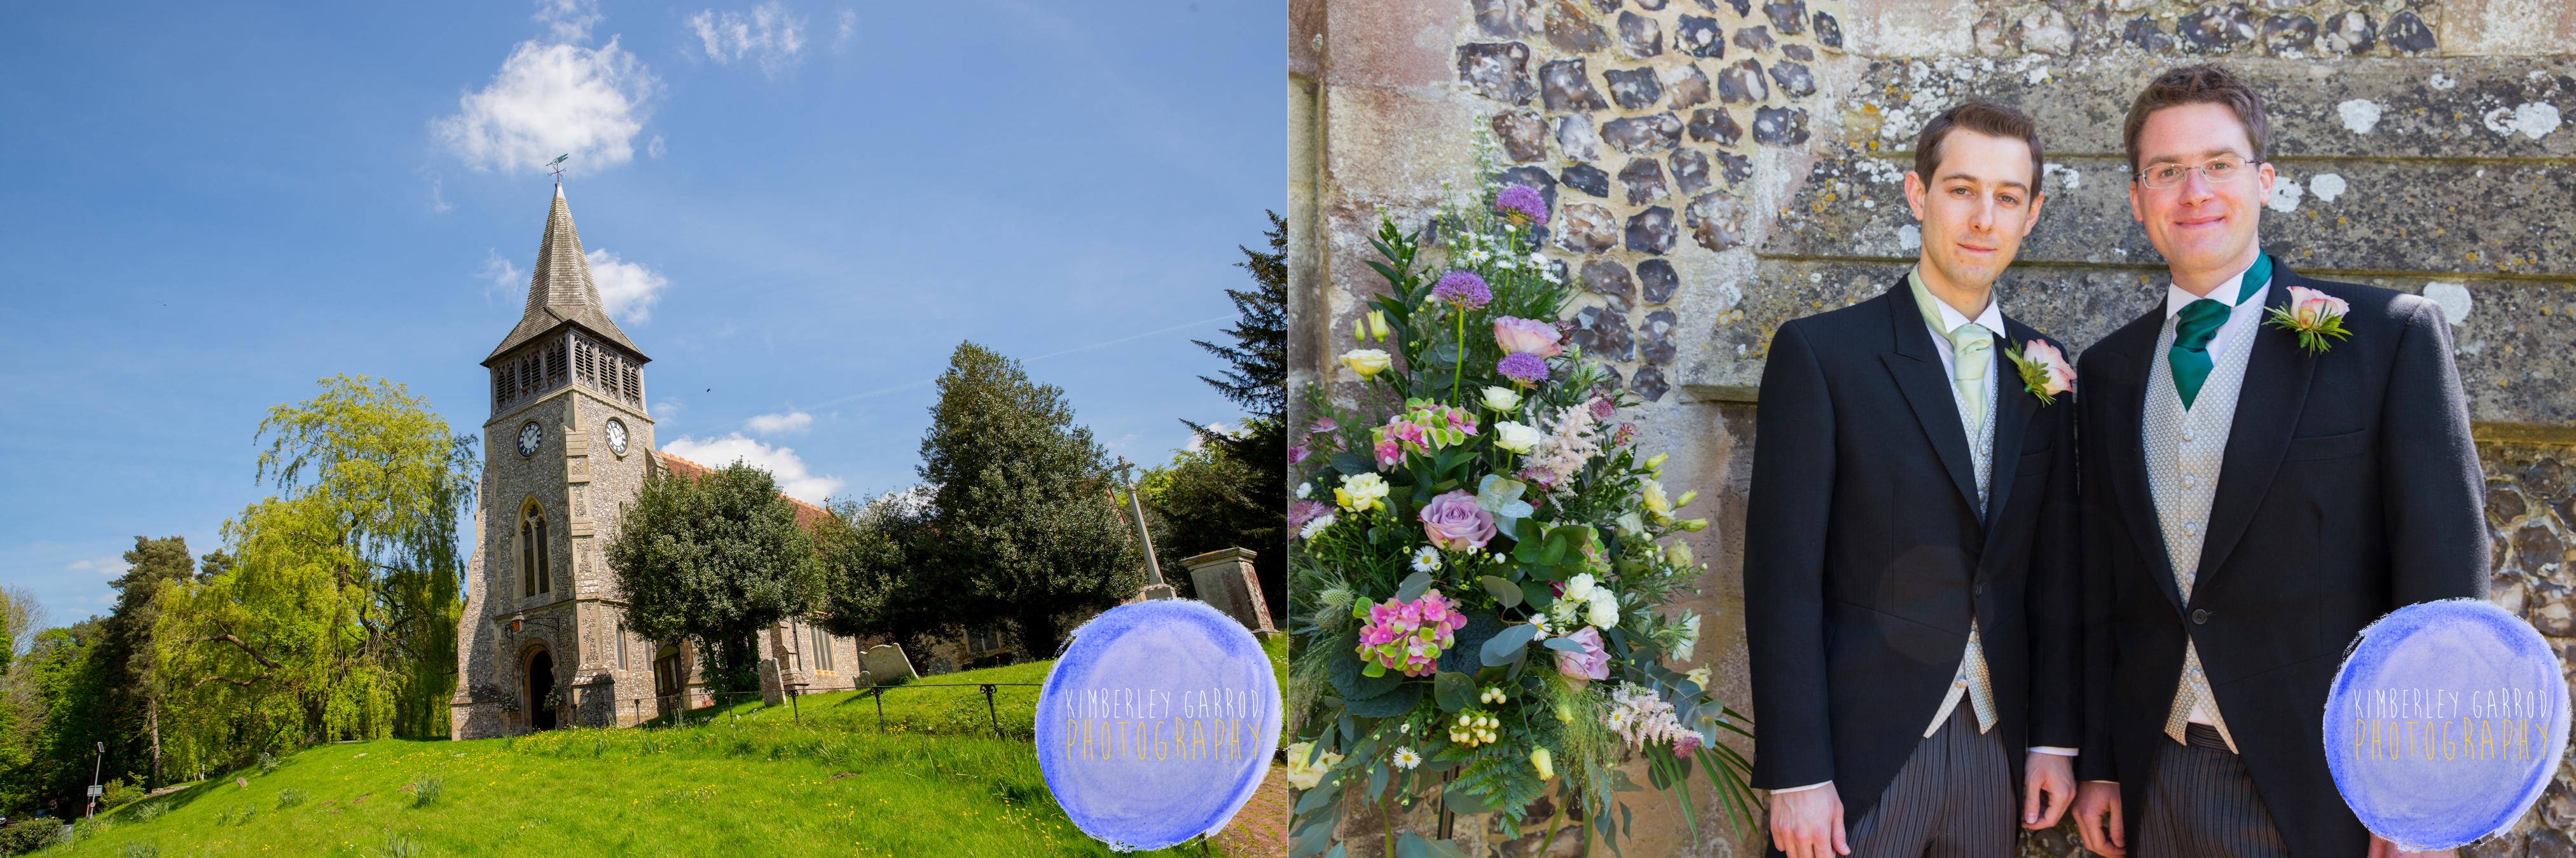 Wickham Church Wedding Kimberley Garrod Photography